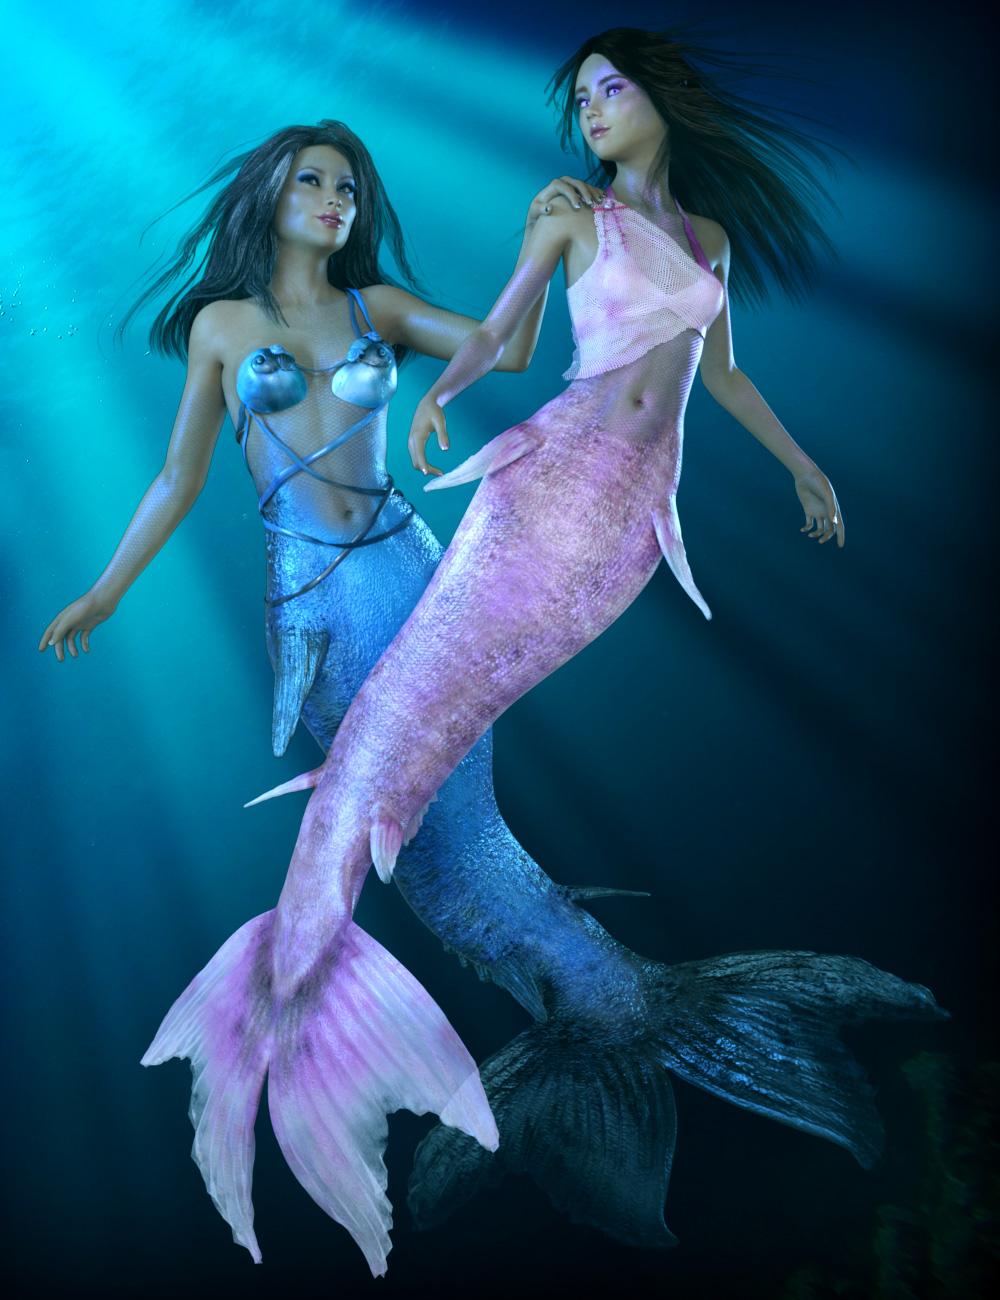 Laguna-Colors for Mermaid Set by: esha, 3D Models by Daz 3D